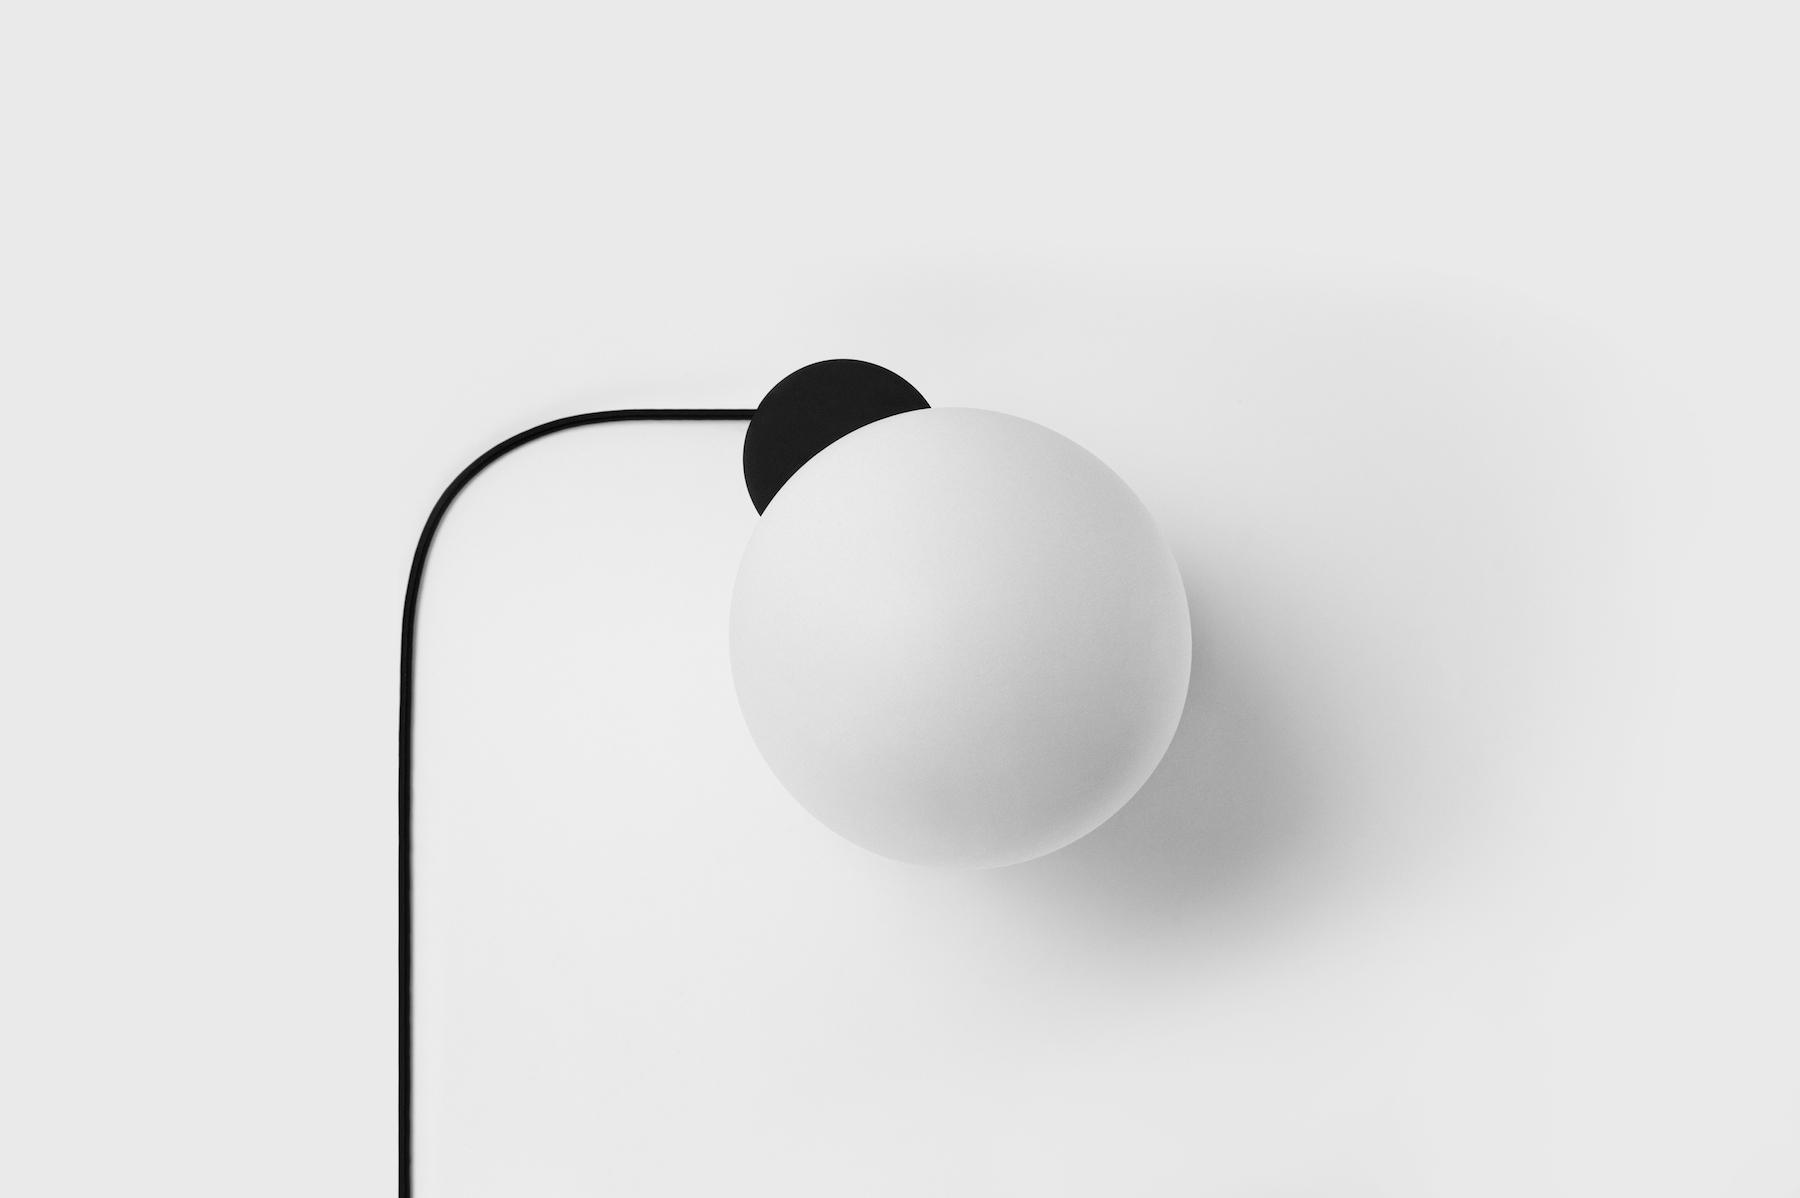 Lu-Lamp-by-Alissa-Coe-Lera-Moiseeva_01.jpg